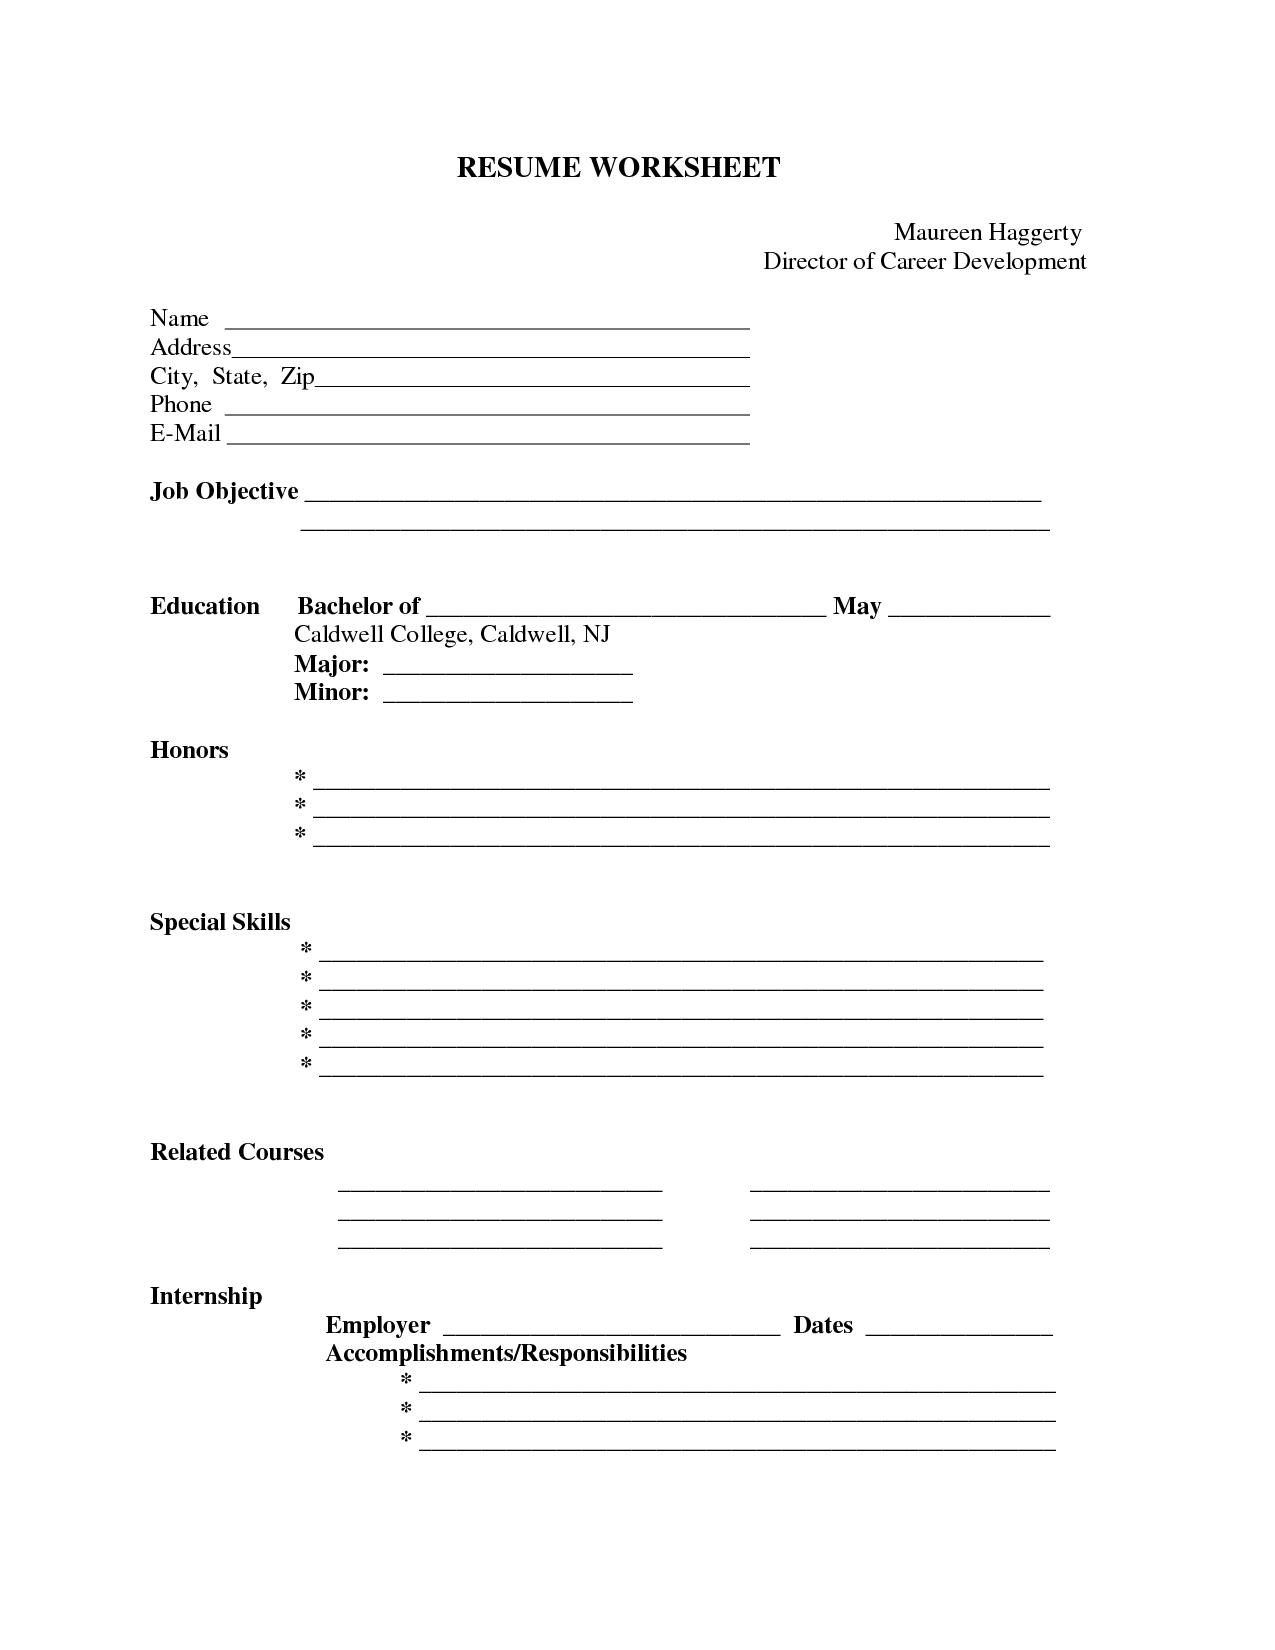 10 Best Images Of Blank Resume Template Worksheet